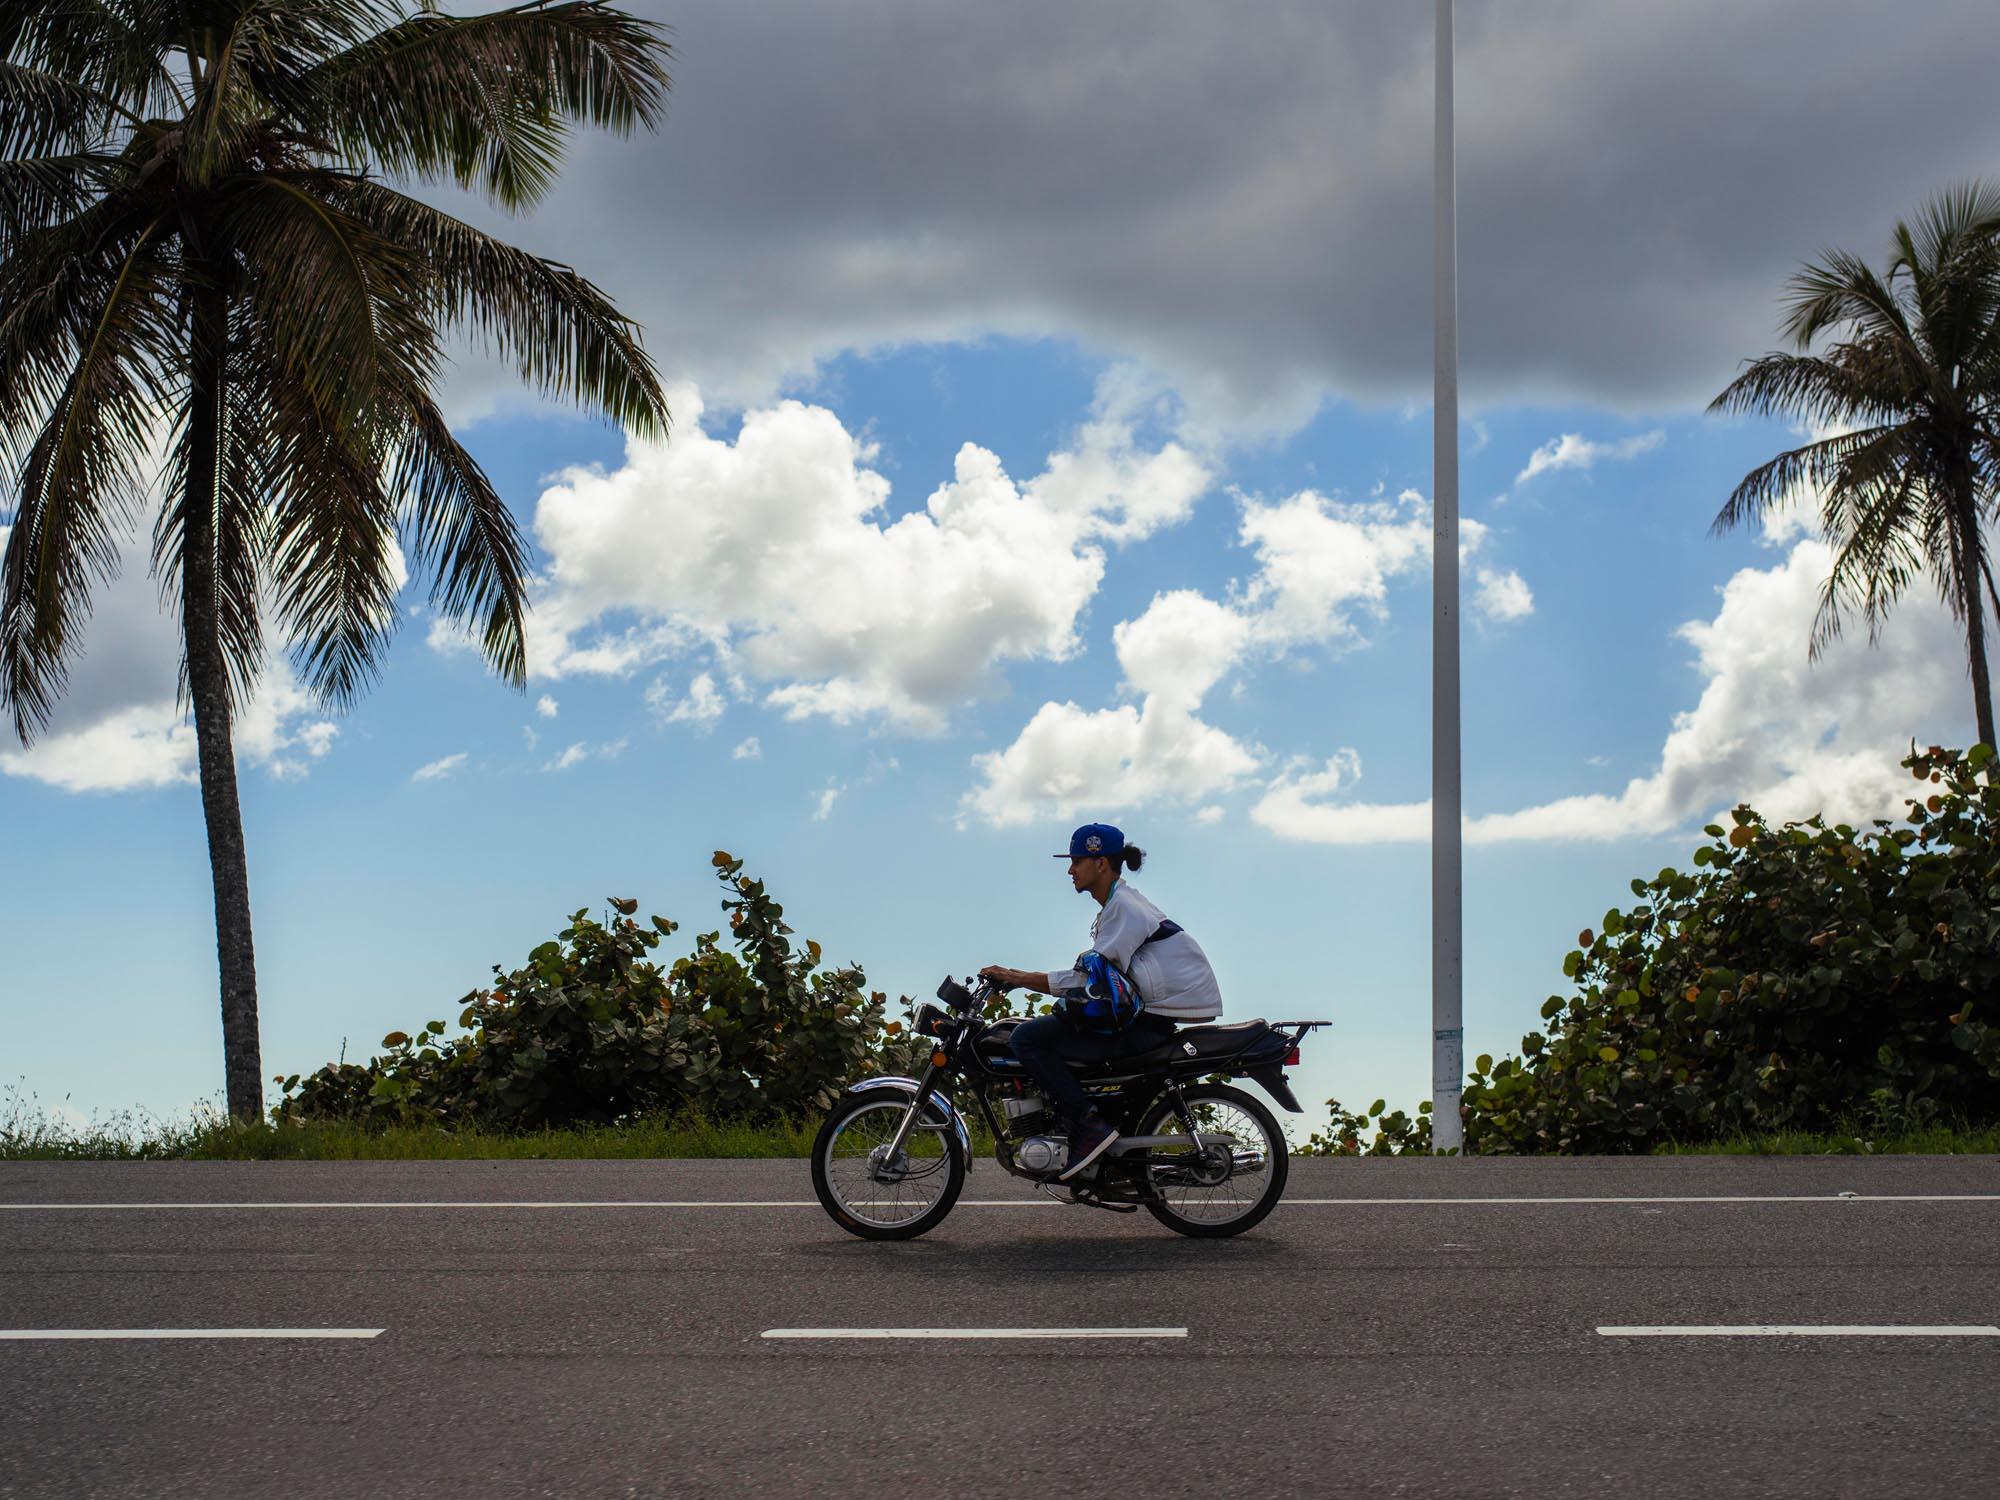 joris-hermans-photography-postcards-dominican-republic-clouds.jpg